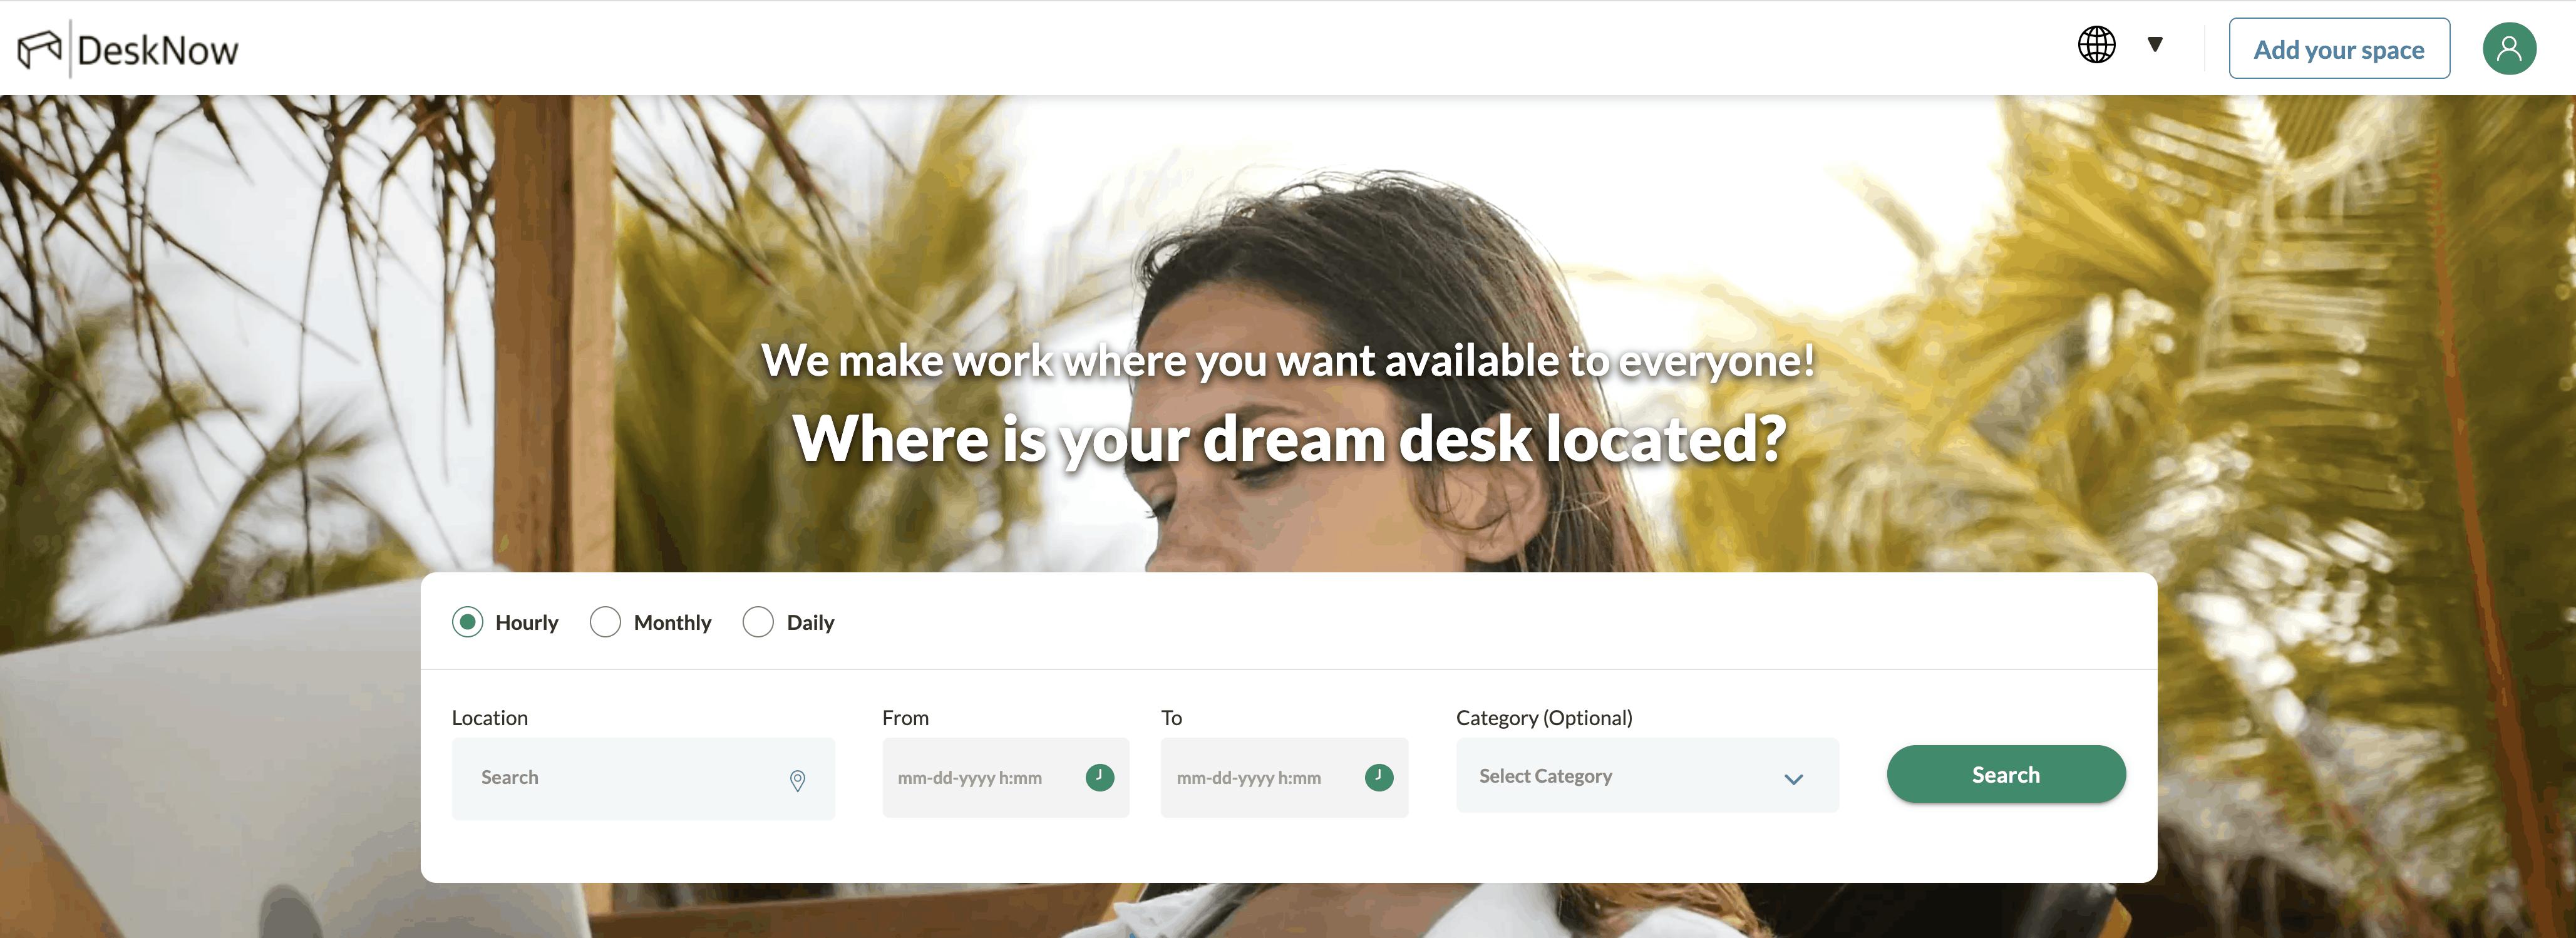 DeskNow SAATKORN Startup Serie